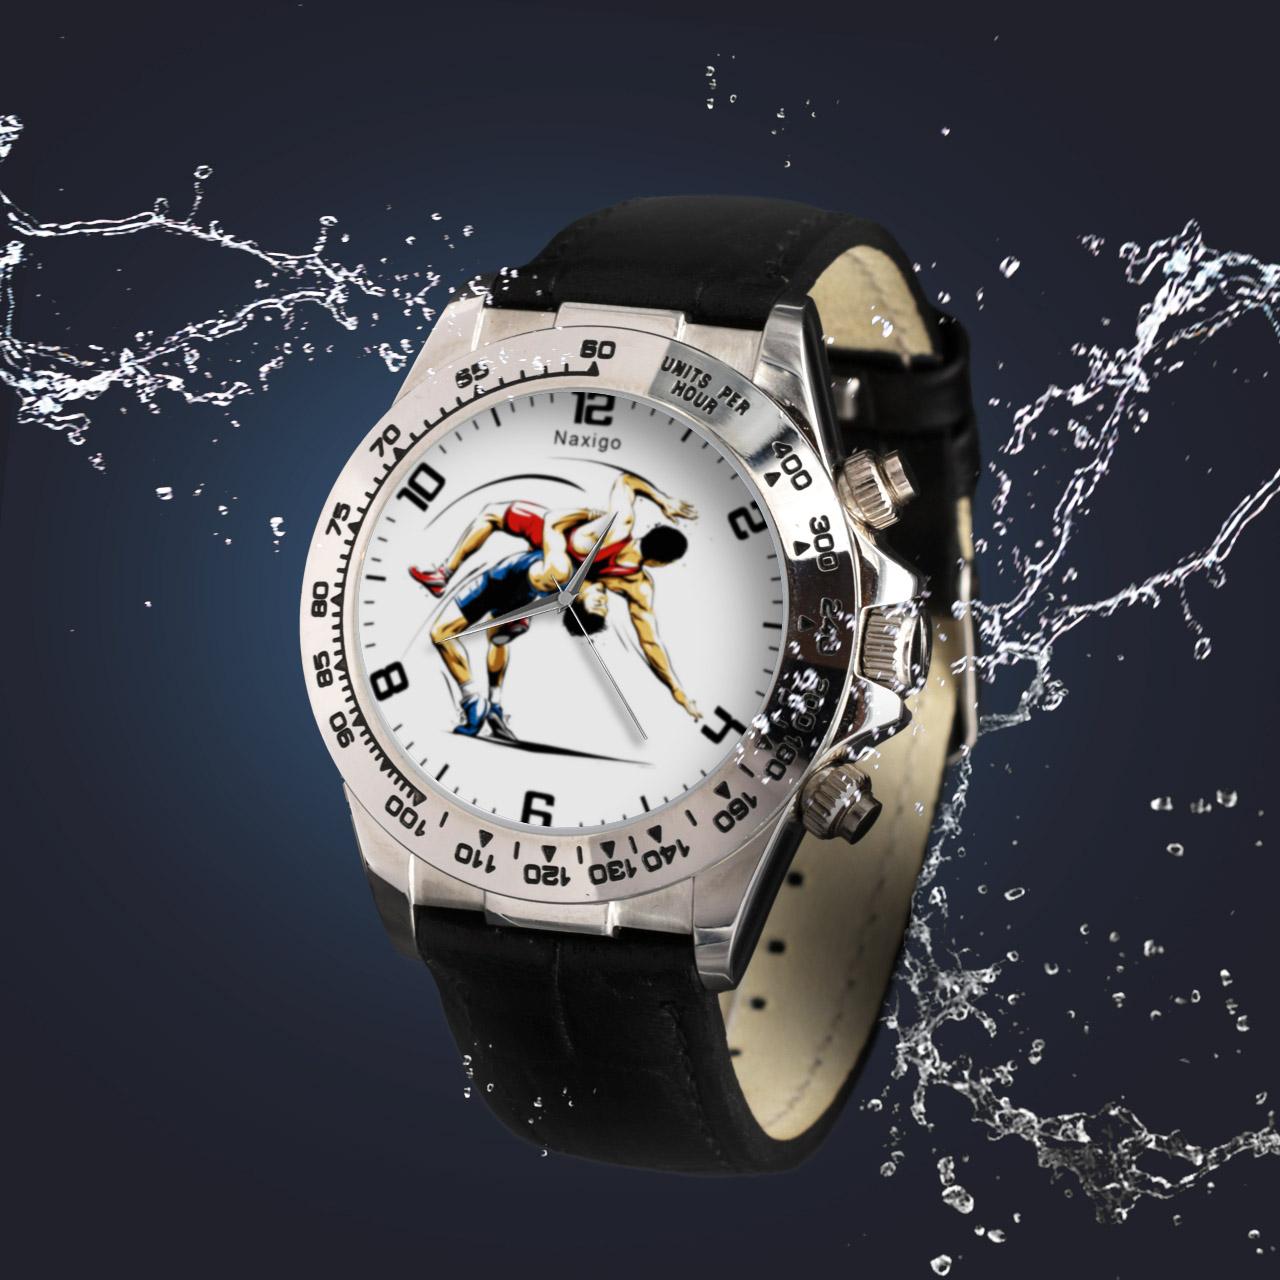 ساعت مچی  مردانه ناکسیگو طرح کشتی گیری کد LS3552